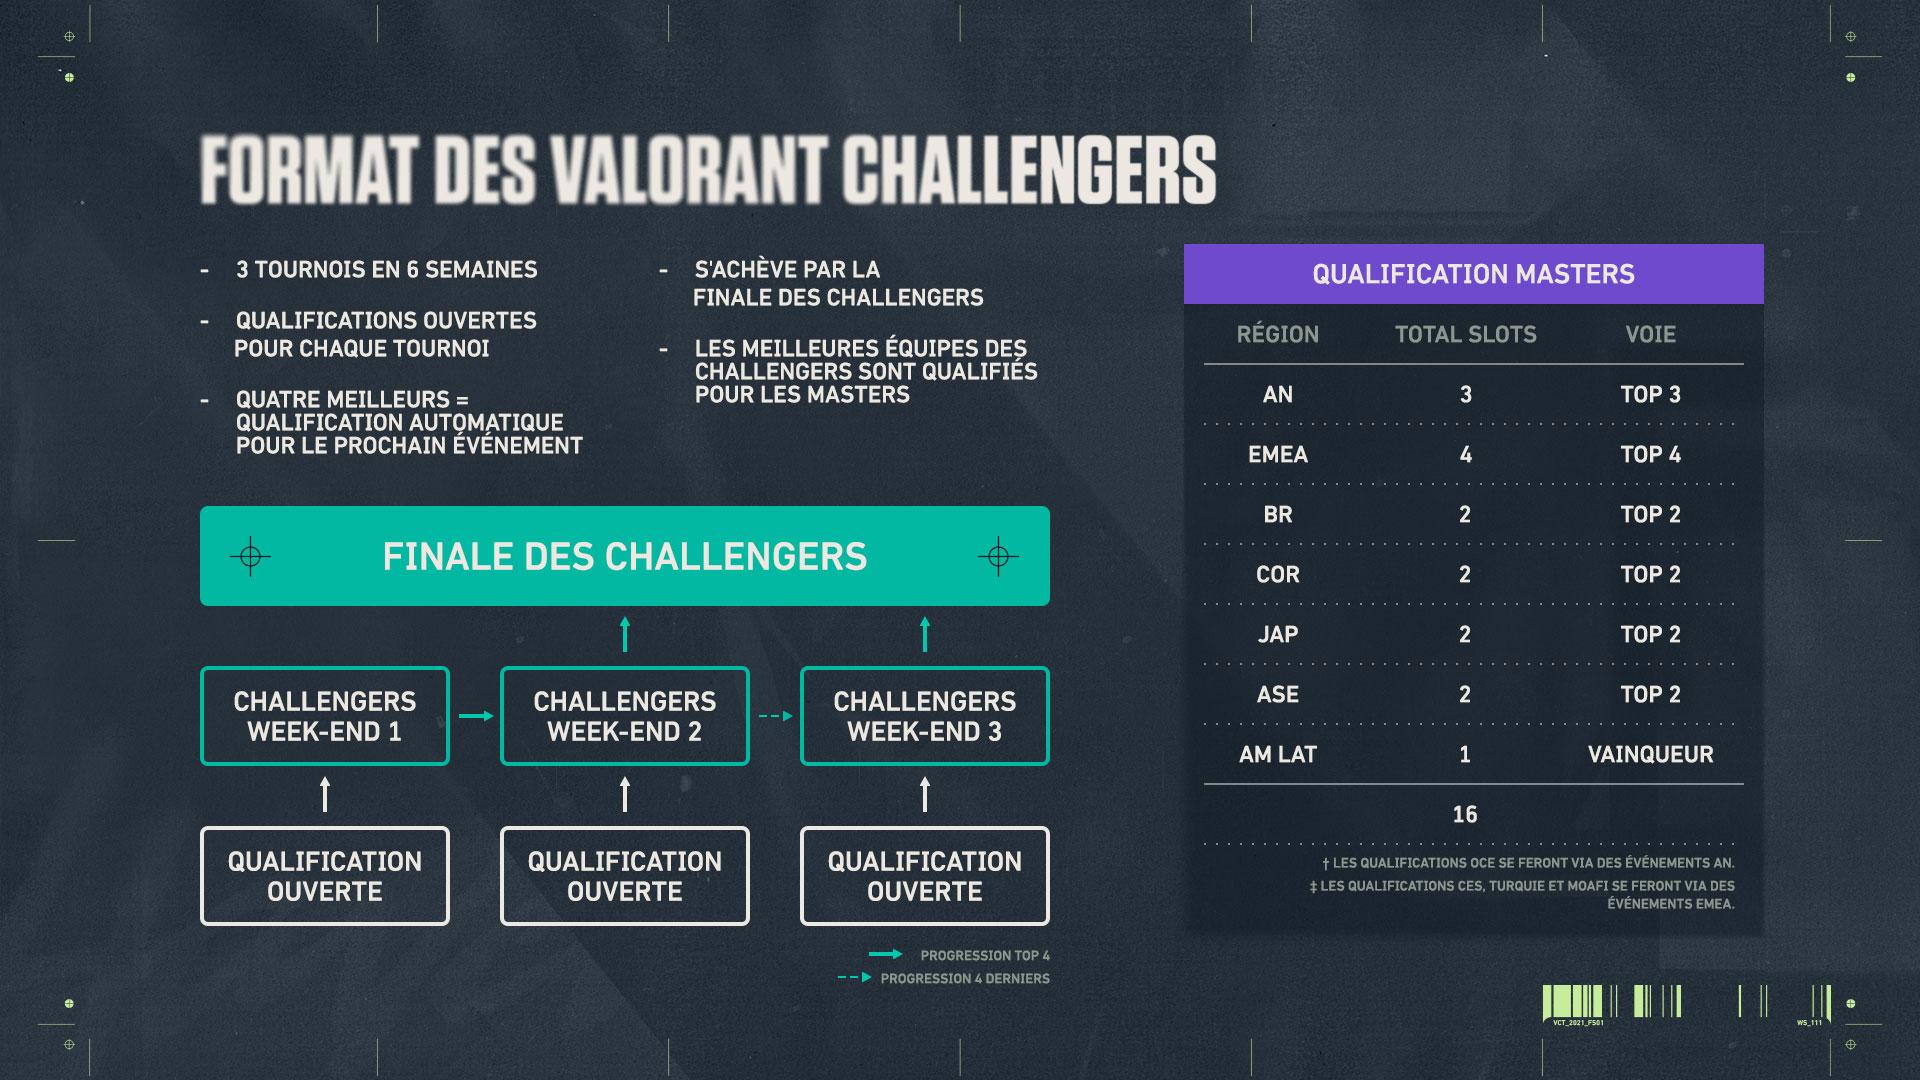 fr_fr_Copy-of-03-challengersformat-v1.0.jpg